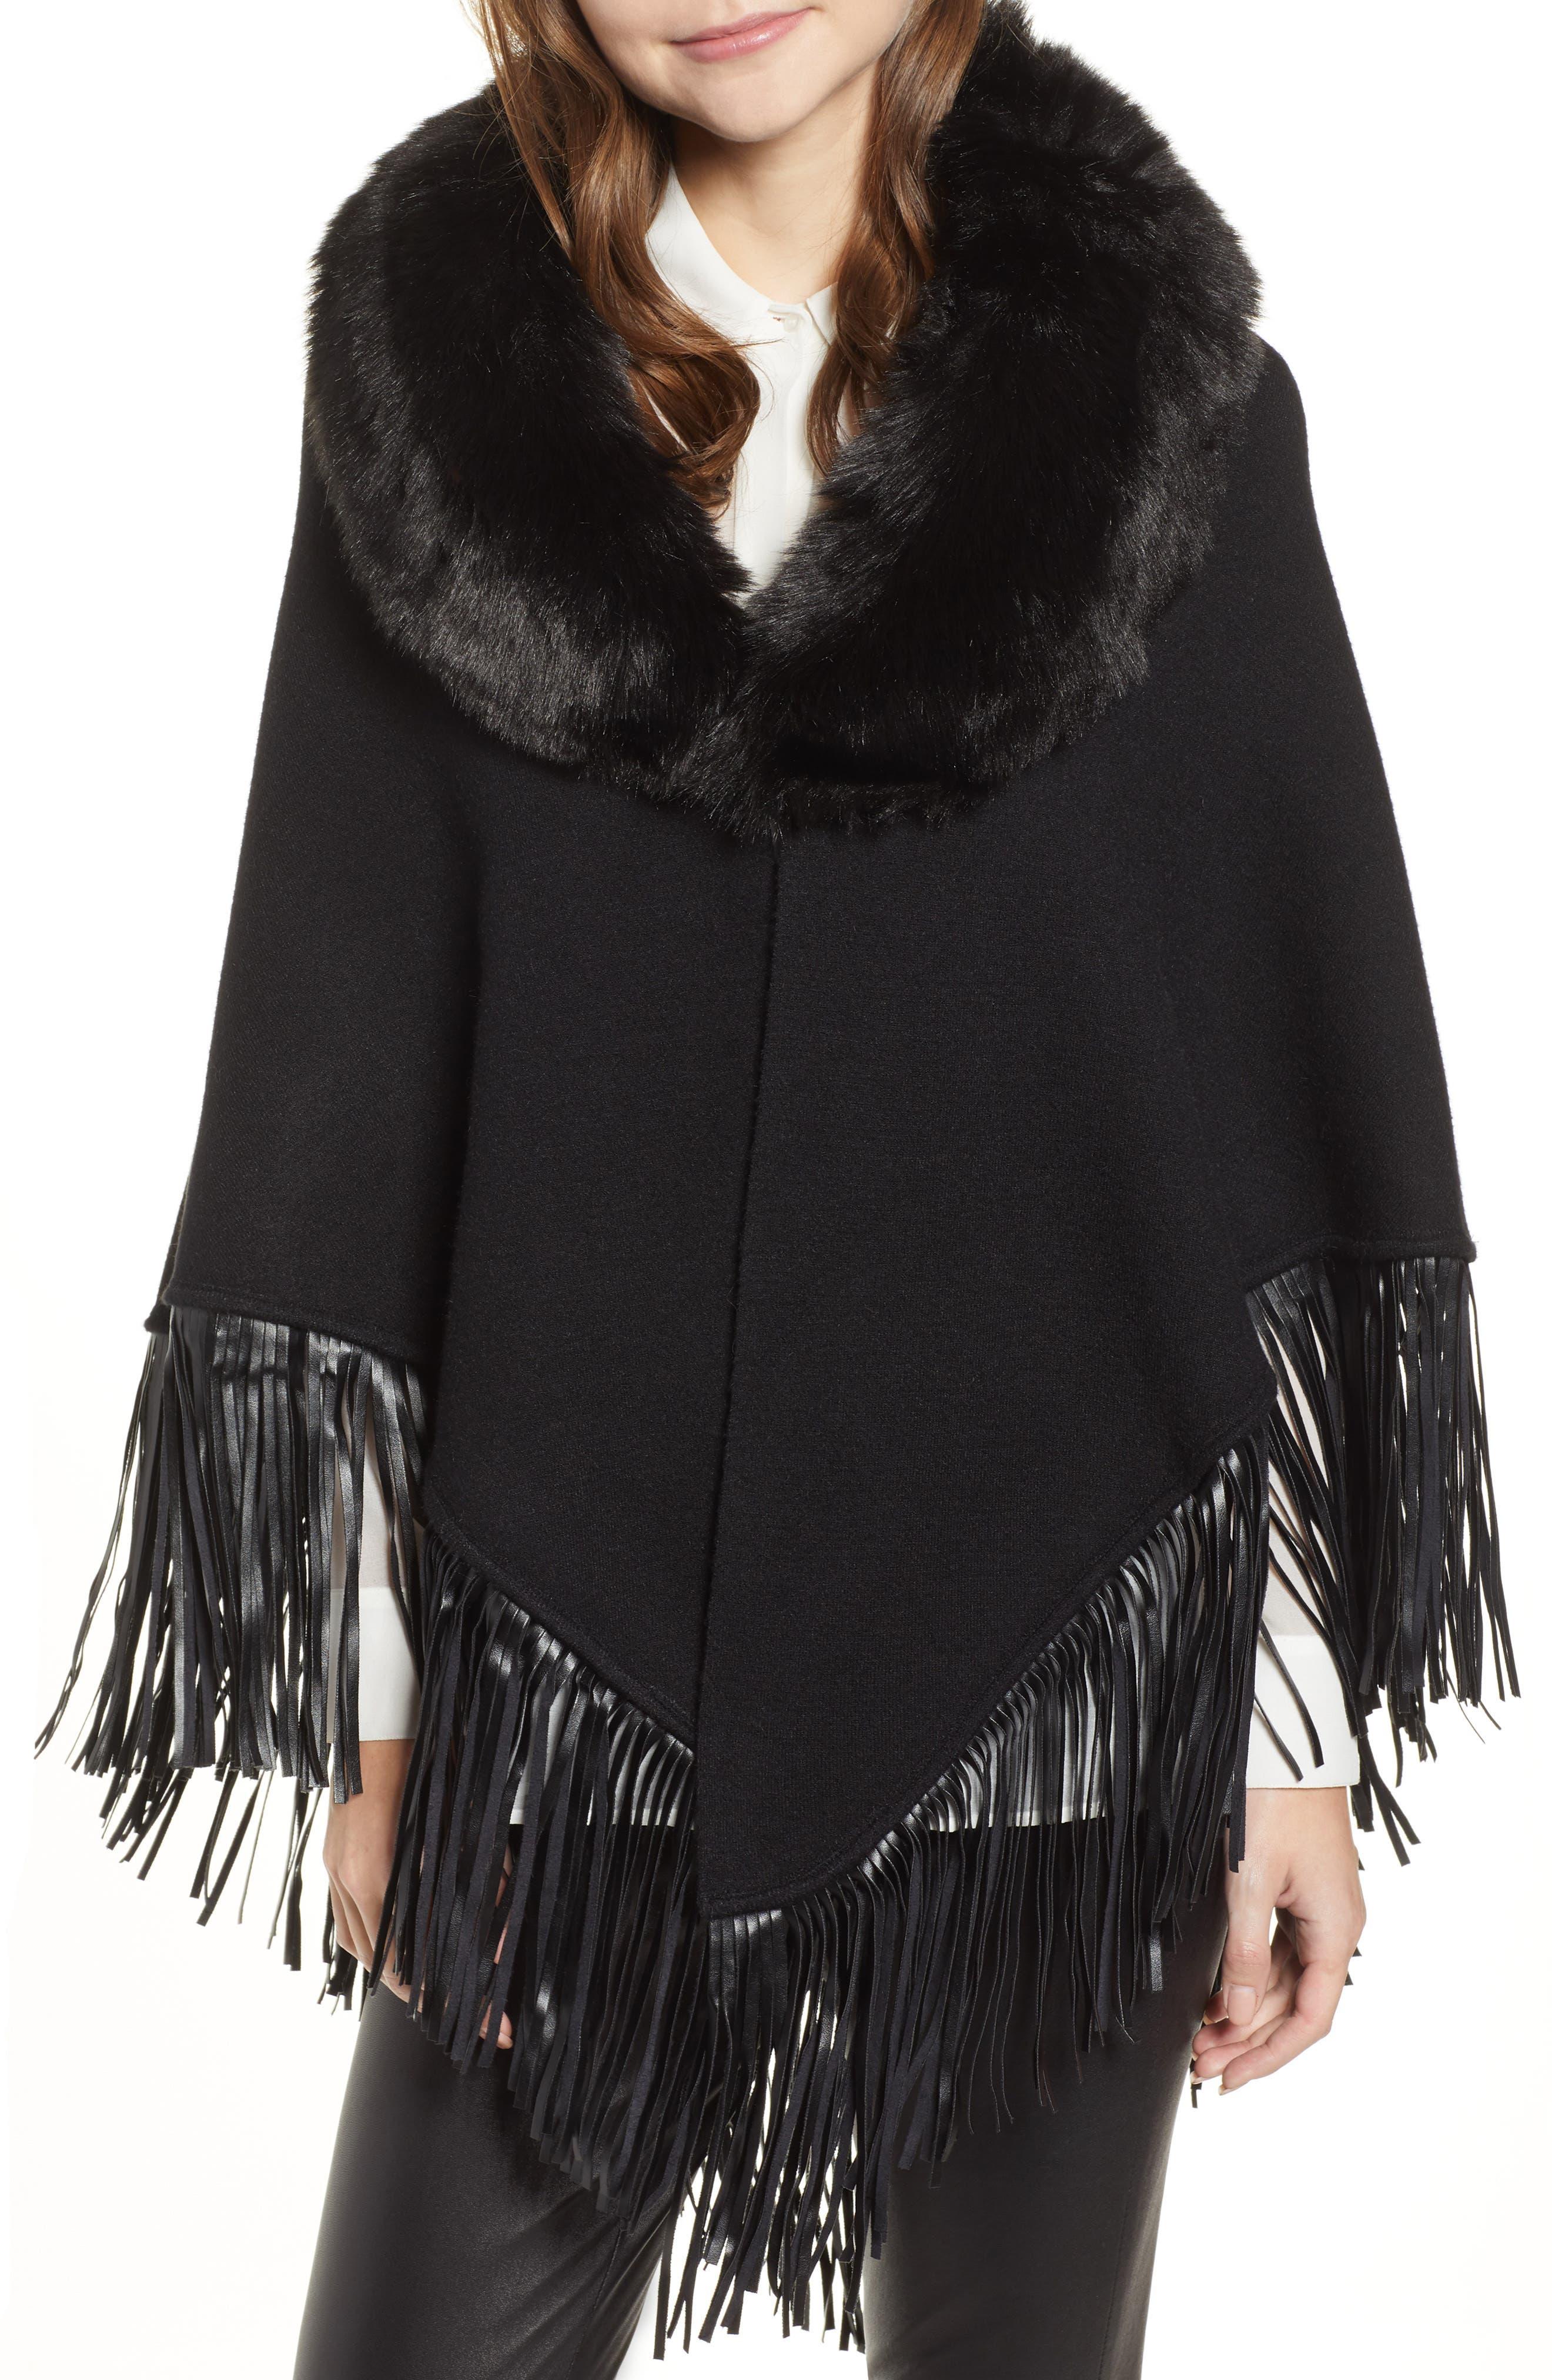 LOVE TOKEN Fringe Poncho With Detachable Faux Fur Collar, Main, color, 001